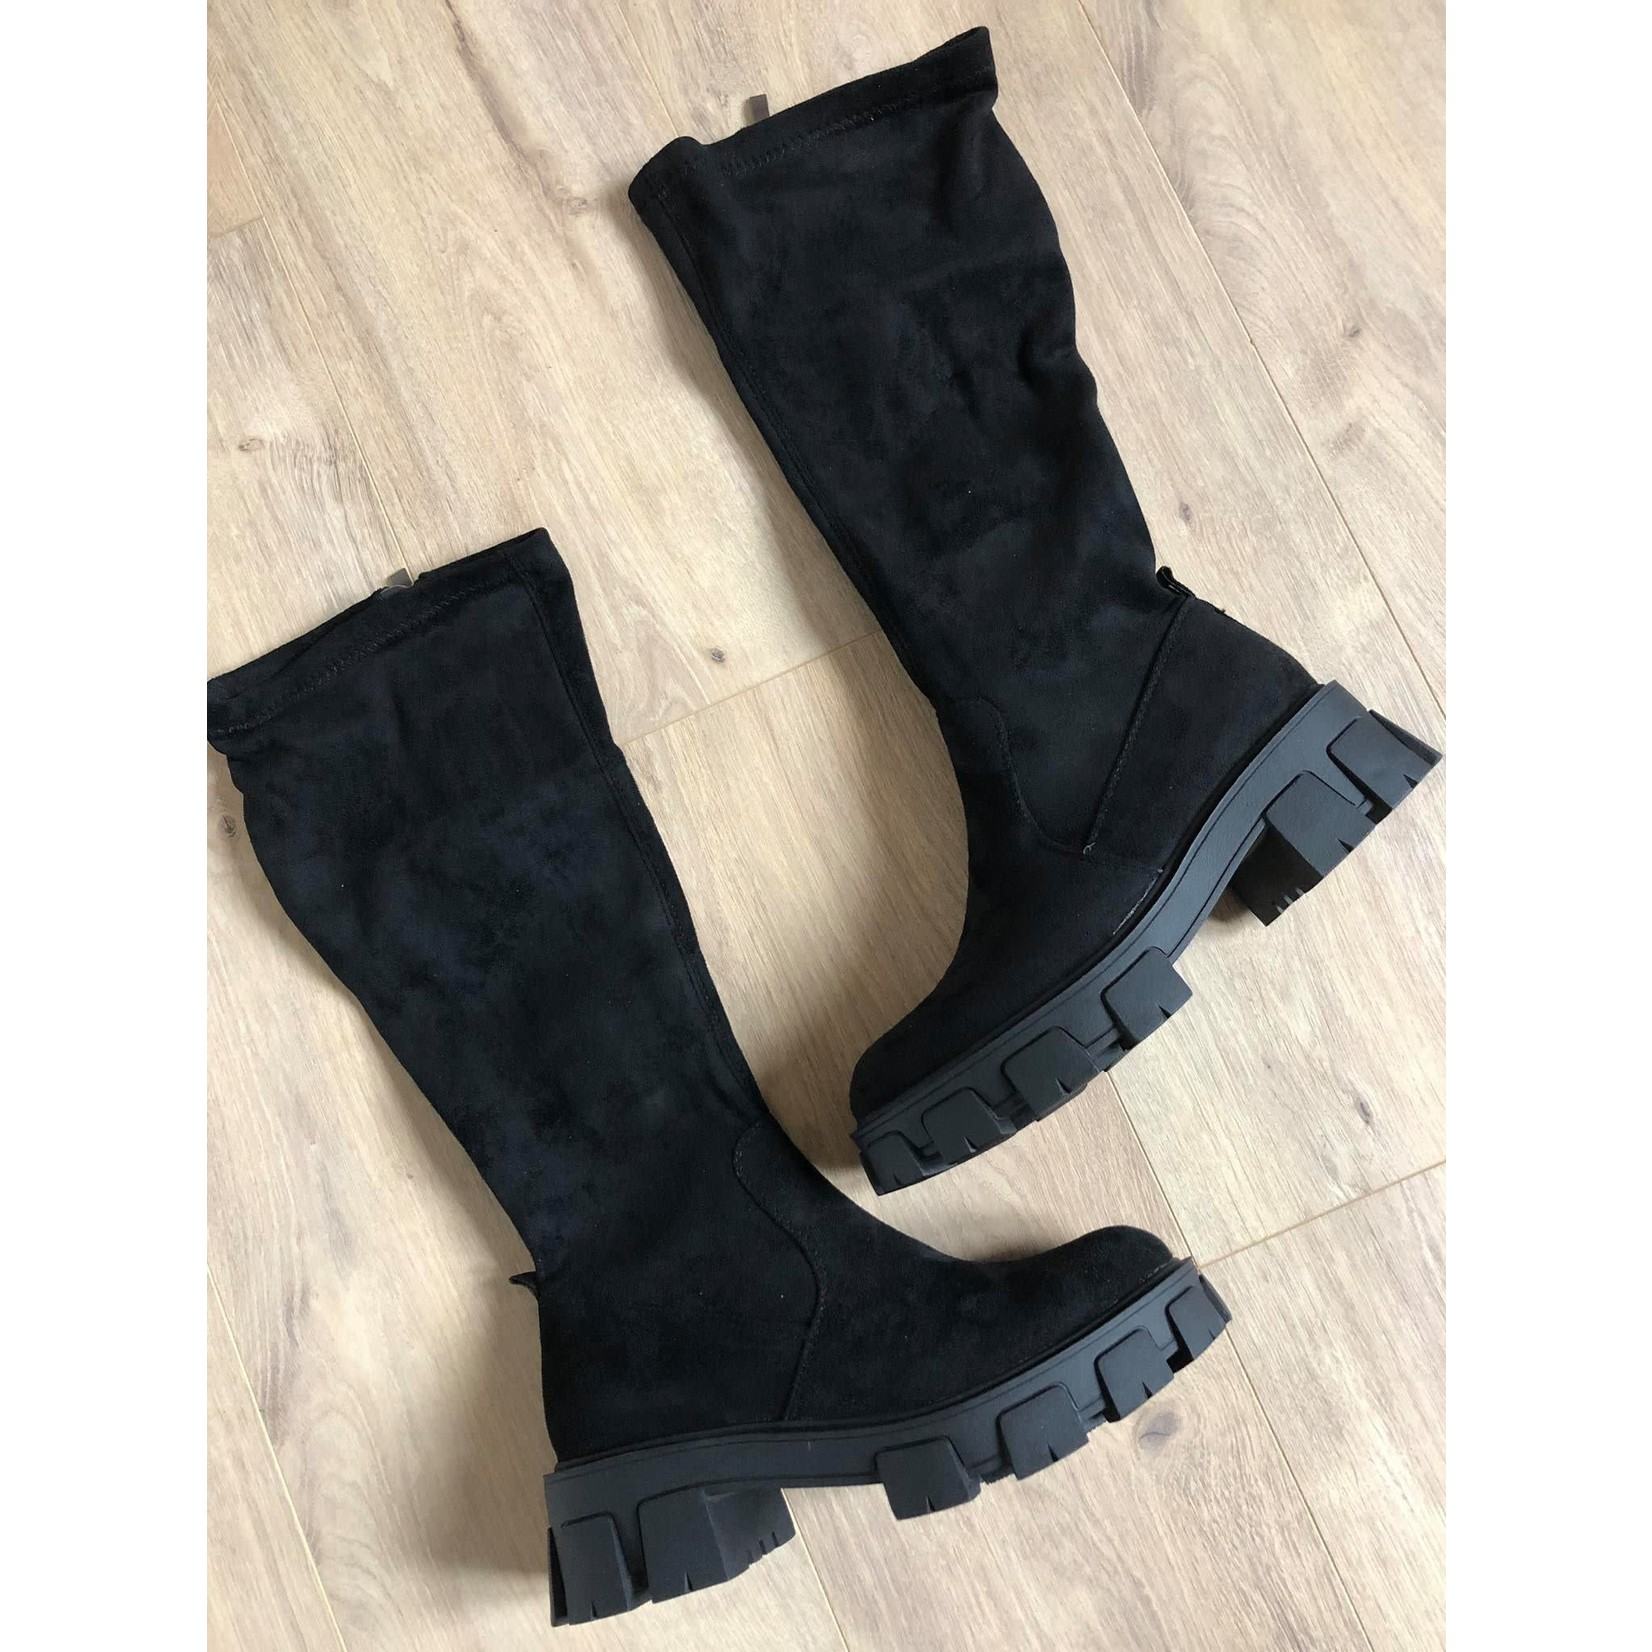 Dream boots black